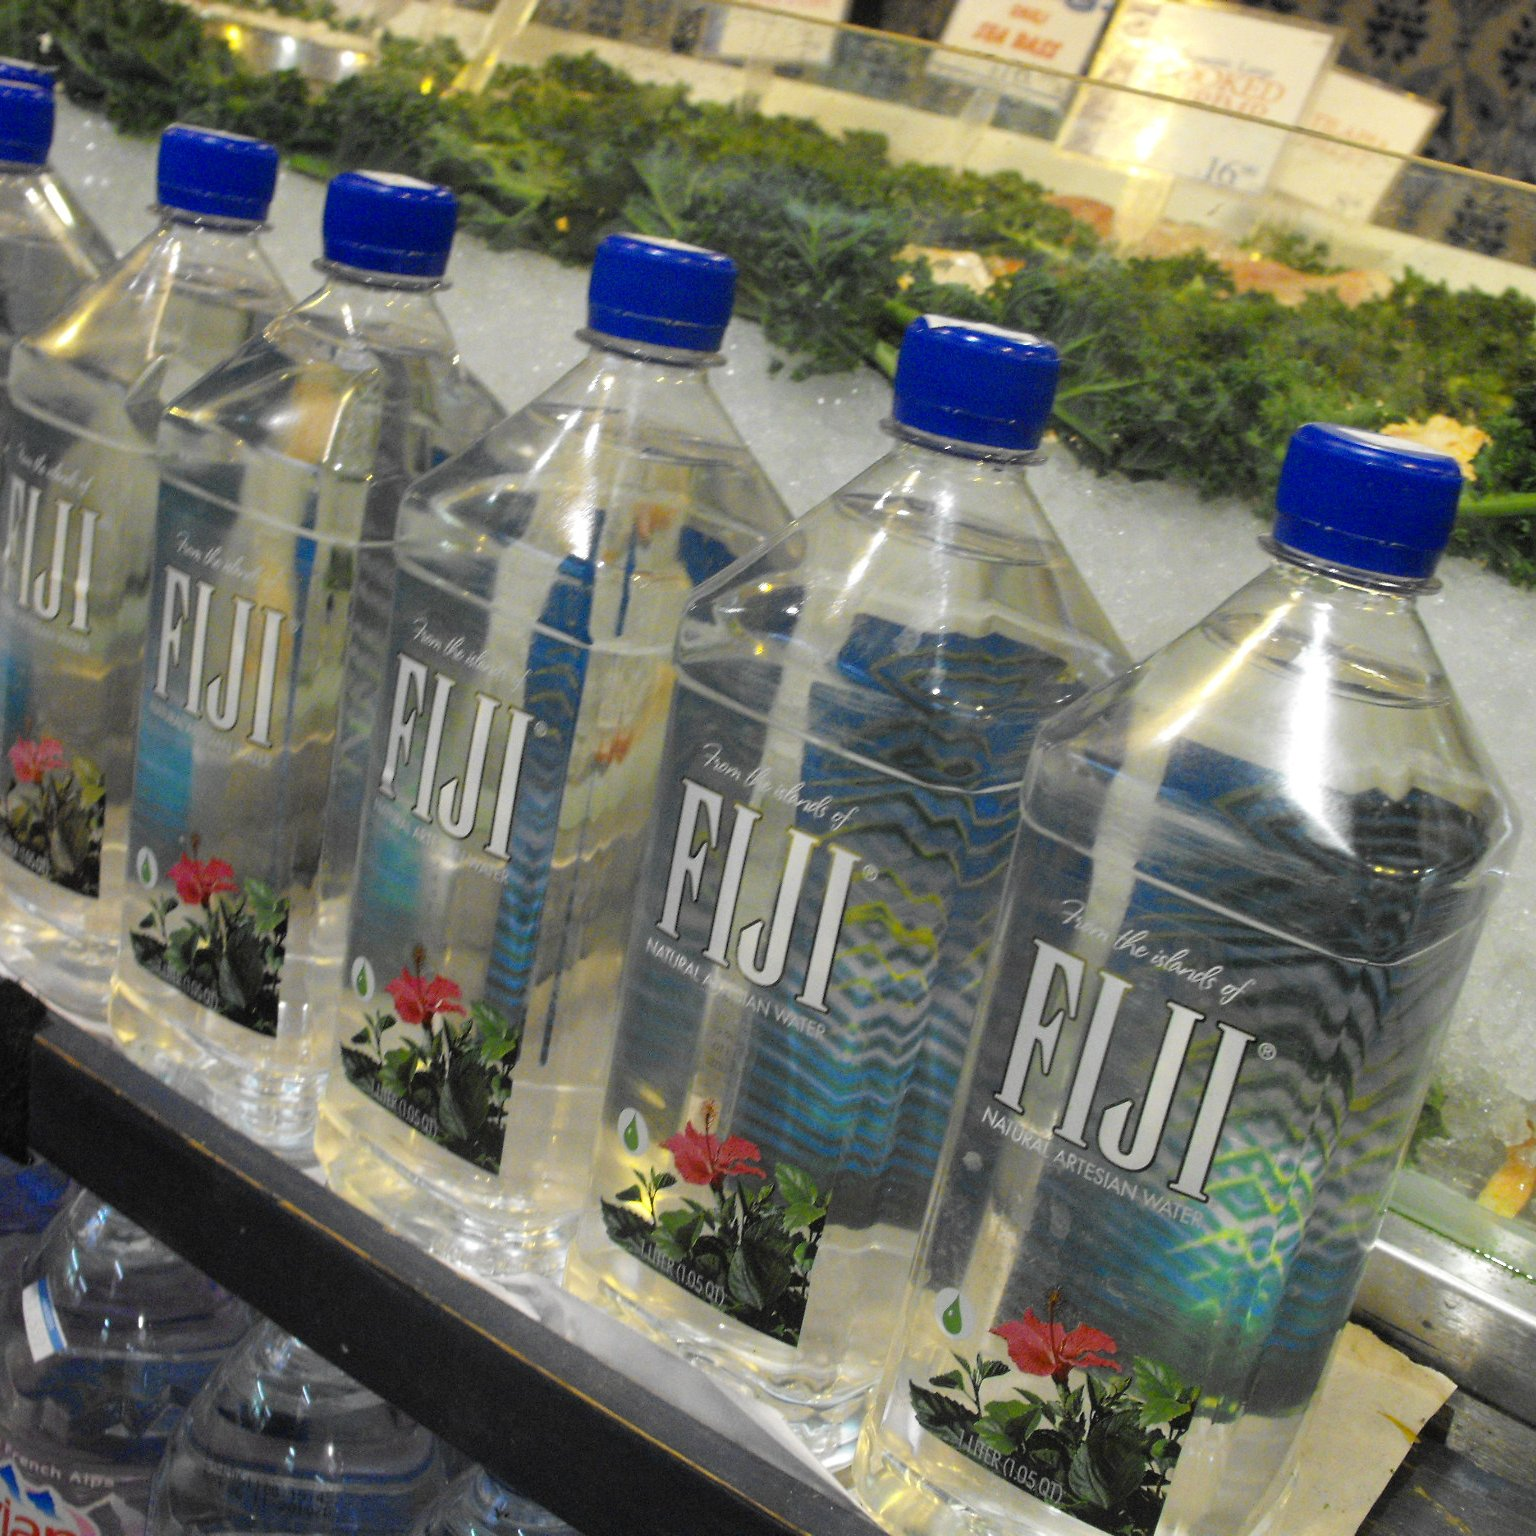 Fiji Water